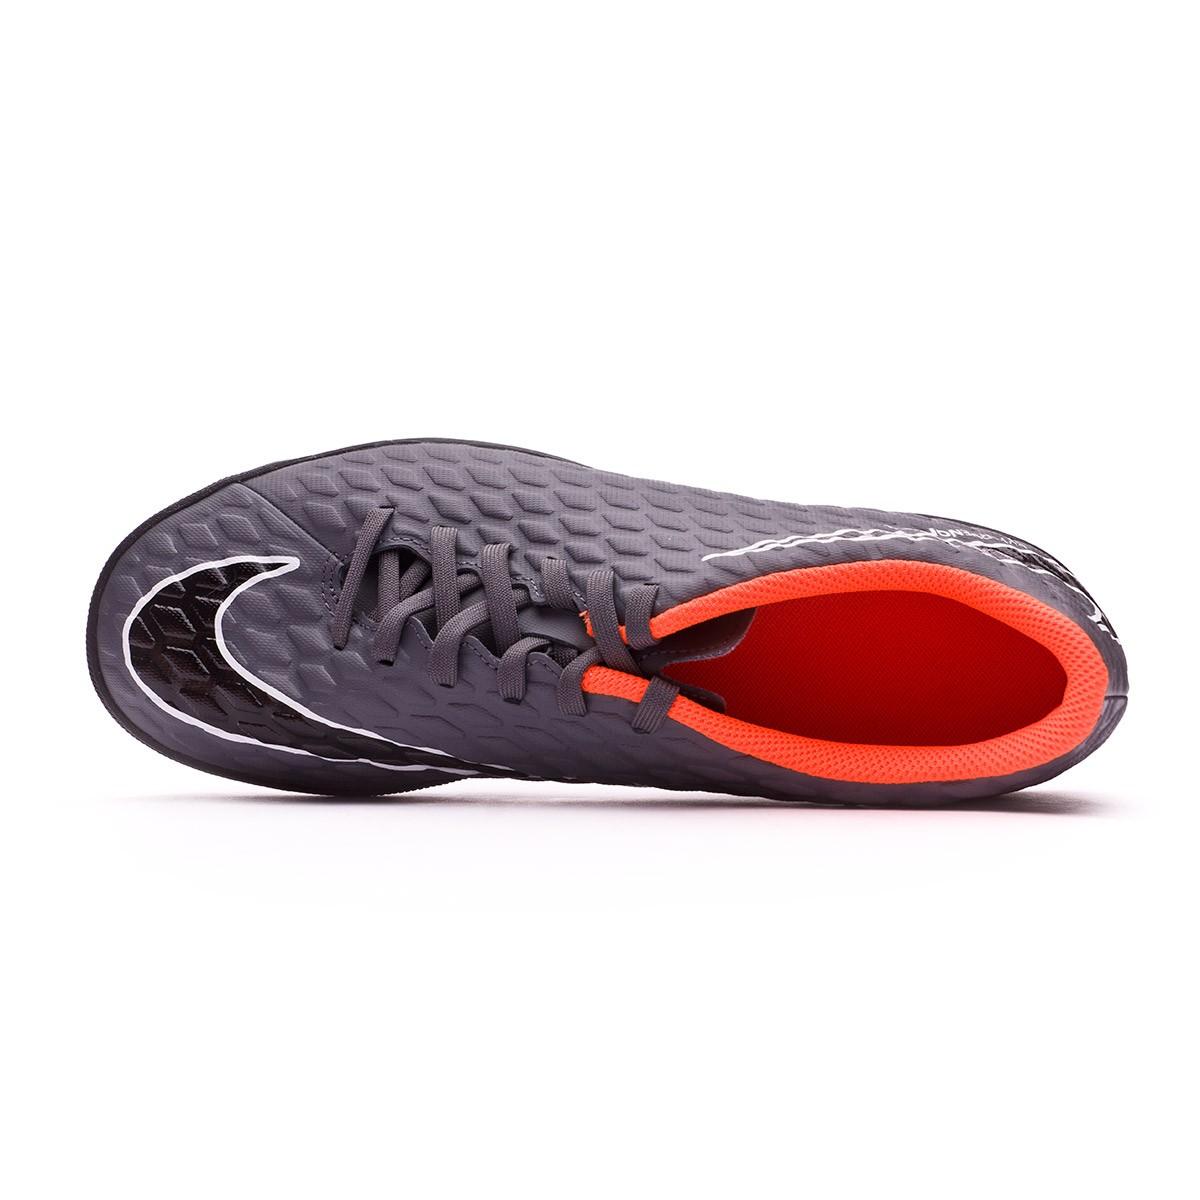 a7945d590fa Football Boot Nike Hypervenom PhantomX III Club Turf Dark grey-Total  orange-White - Soloporteros es ahora Fútbol Emotion